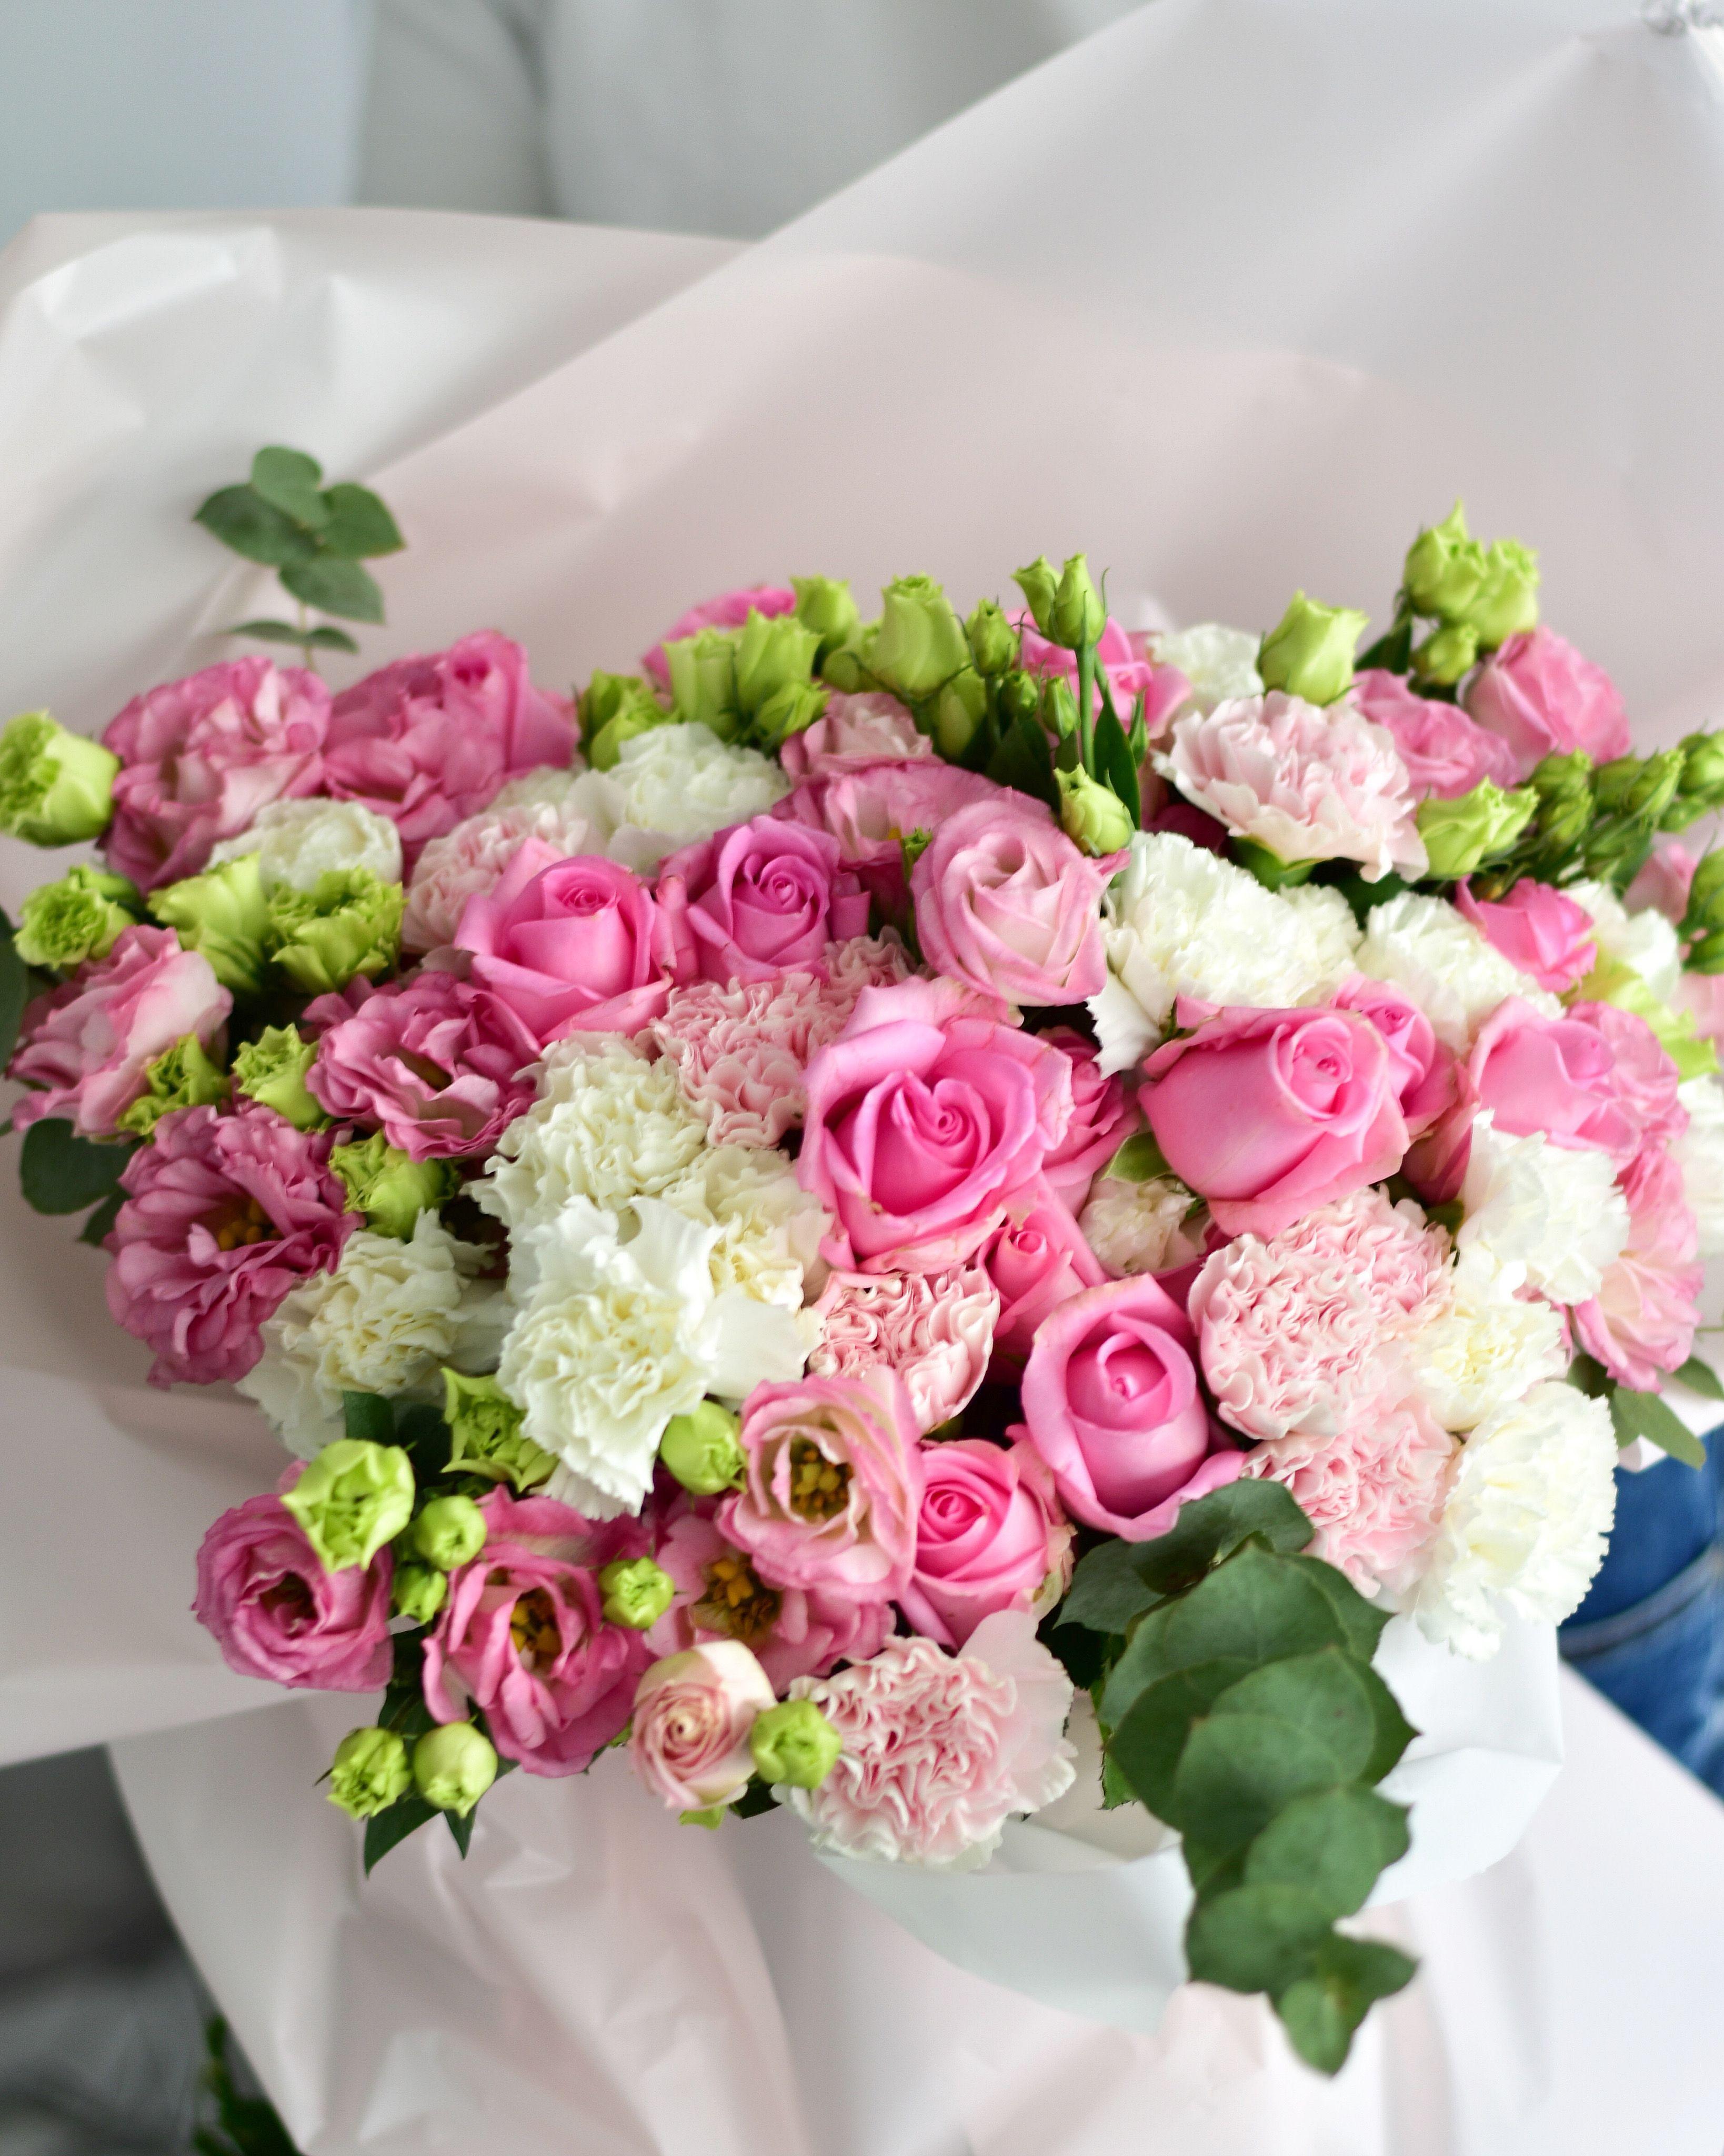 Bukiet Kwiaty Zywe Flower Boxes Floral Wreath Floral